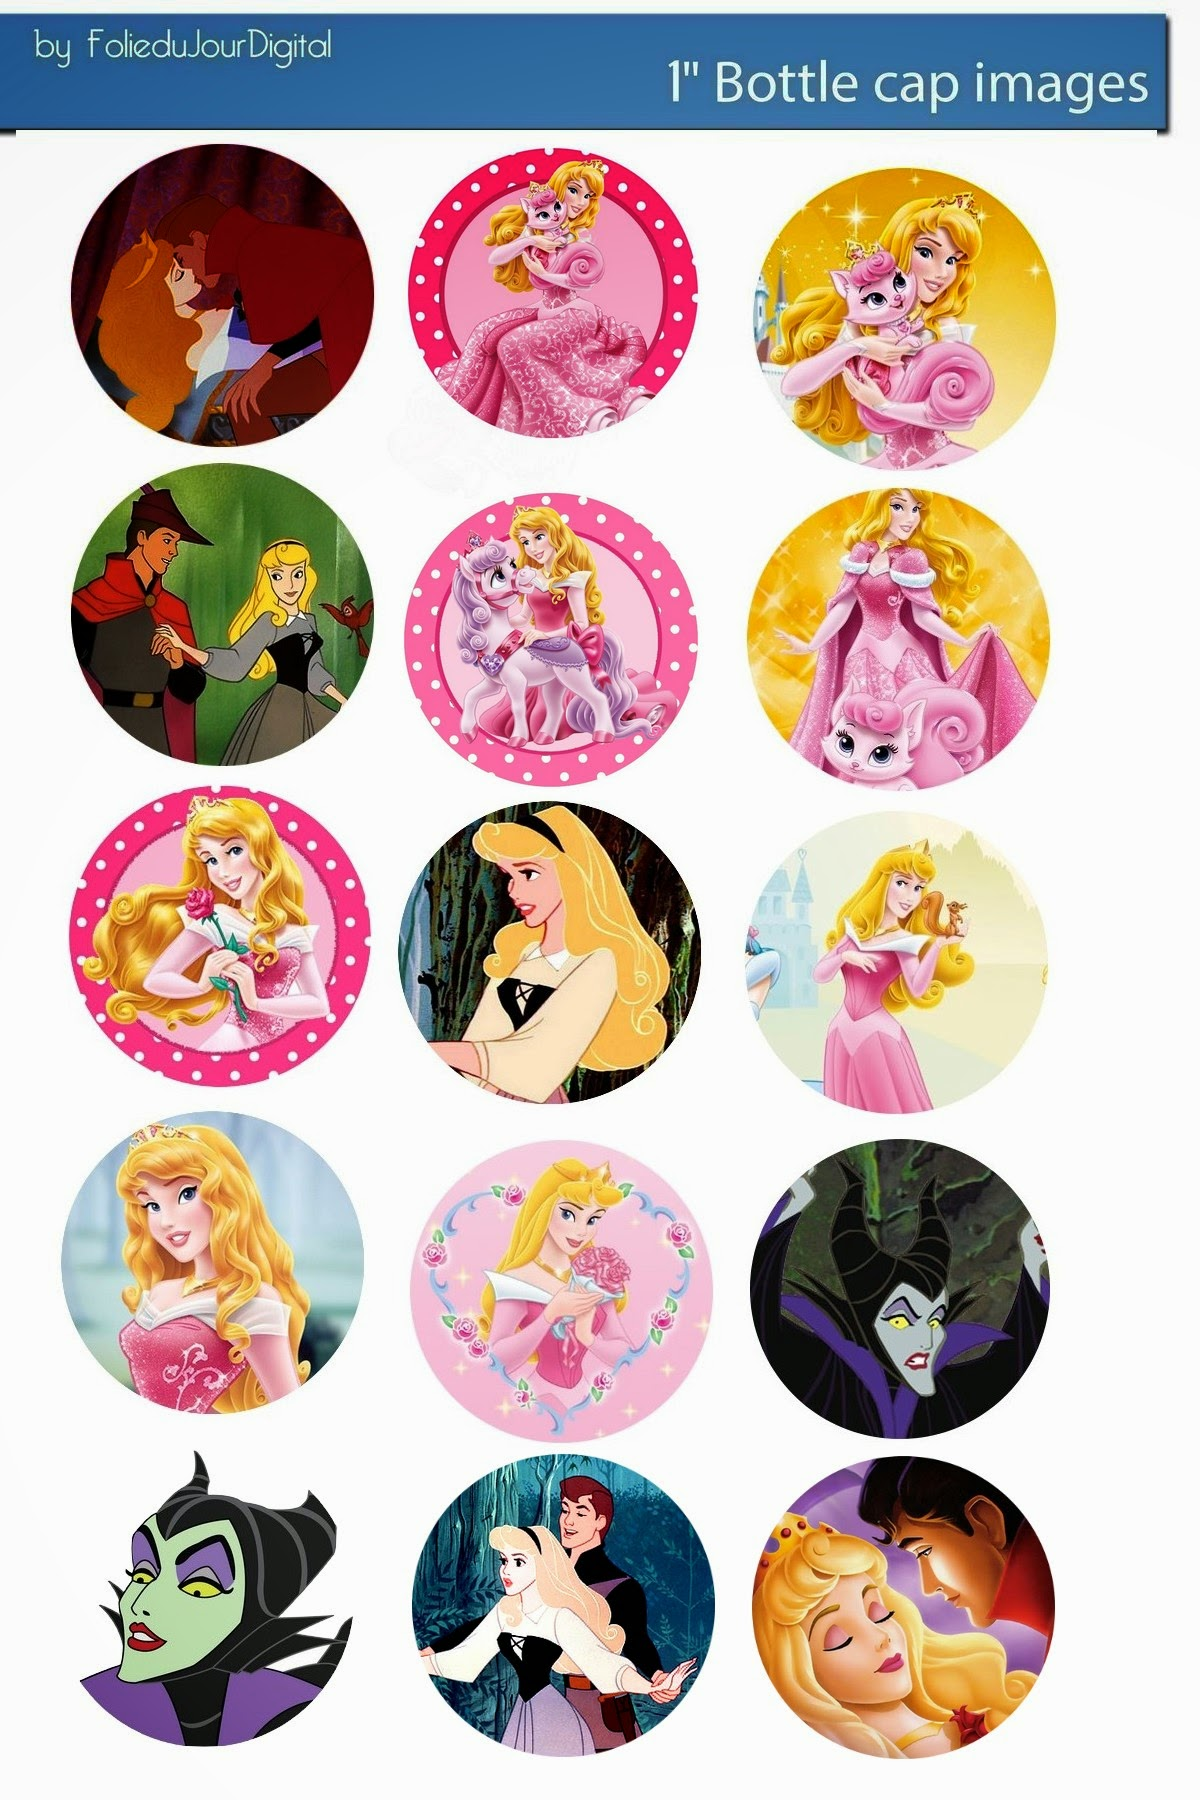 Disney printable magnets designs joy studio design for Bottle cap designs